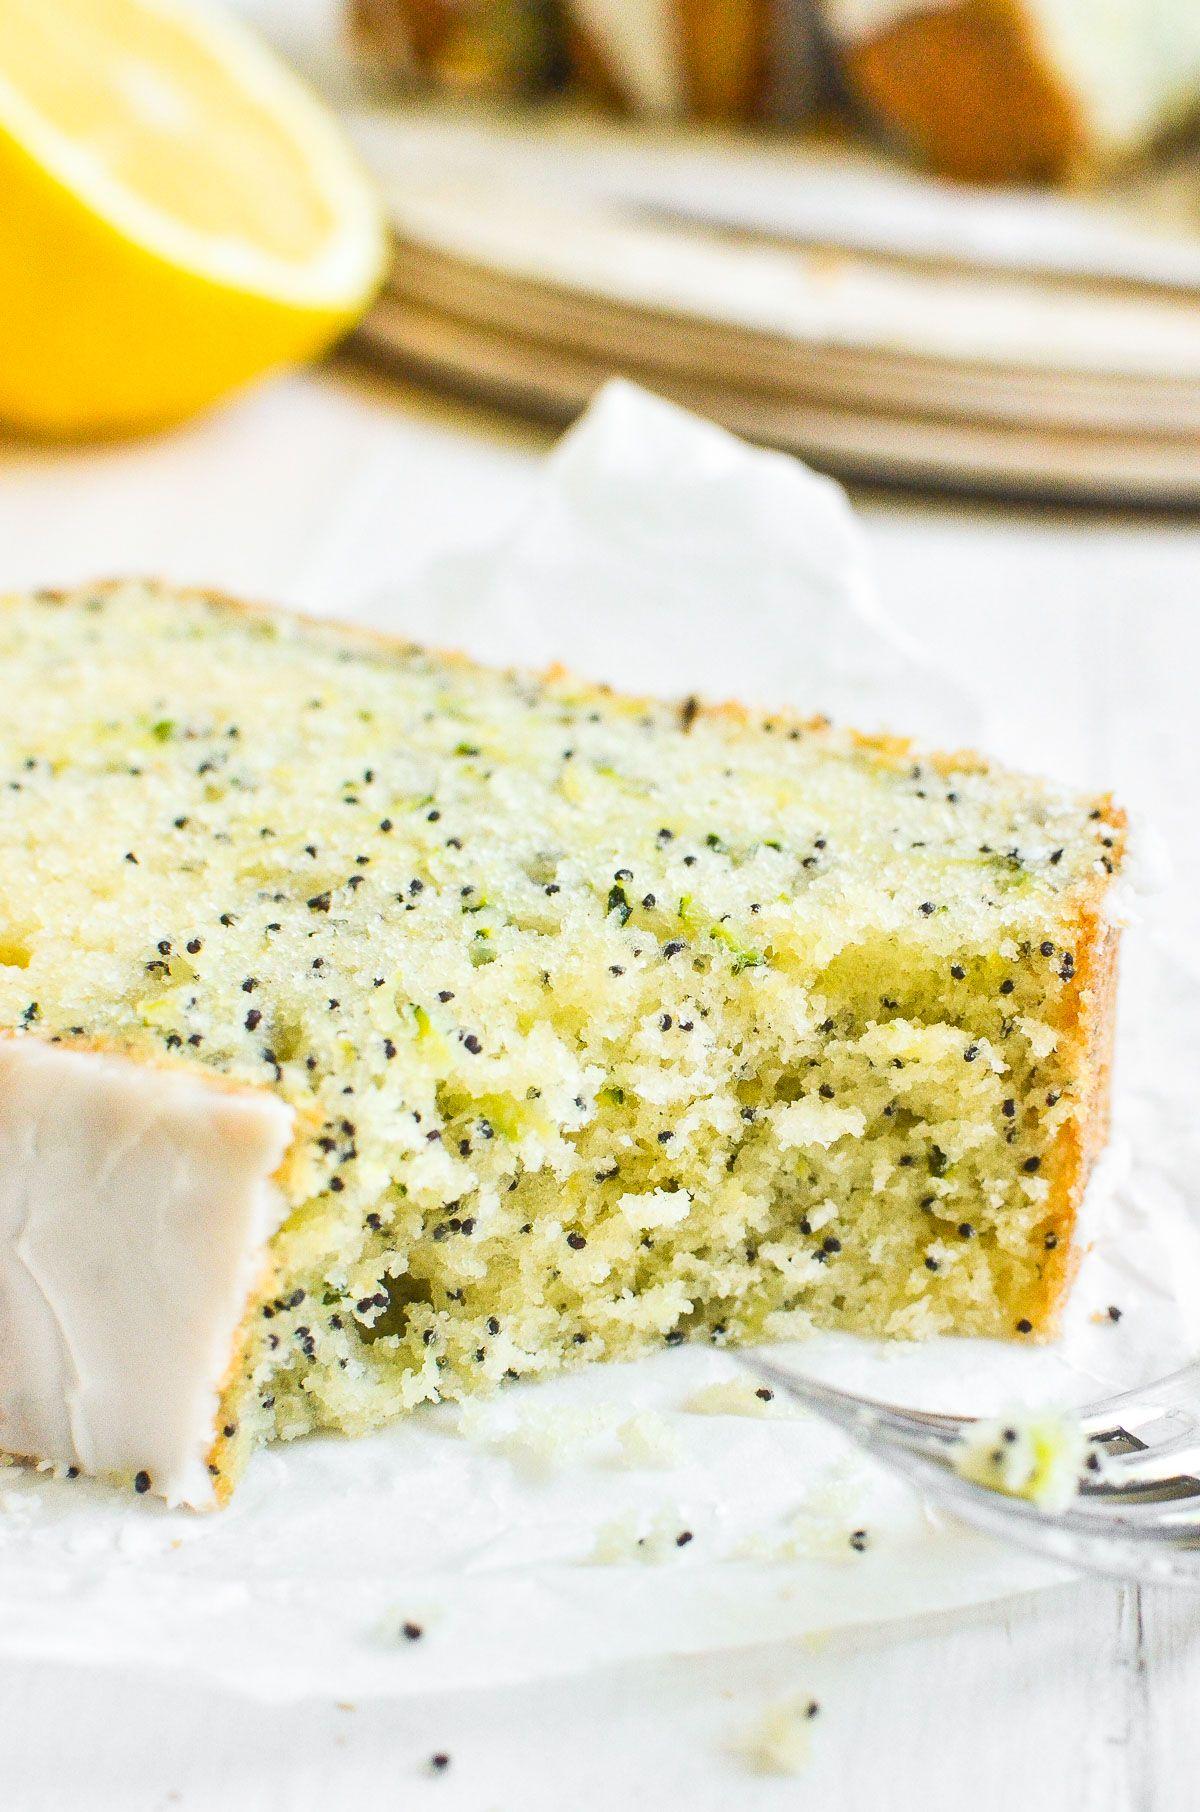 lemon poppy seed zucchini bread with crunchy poppy seeds